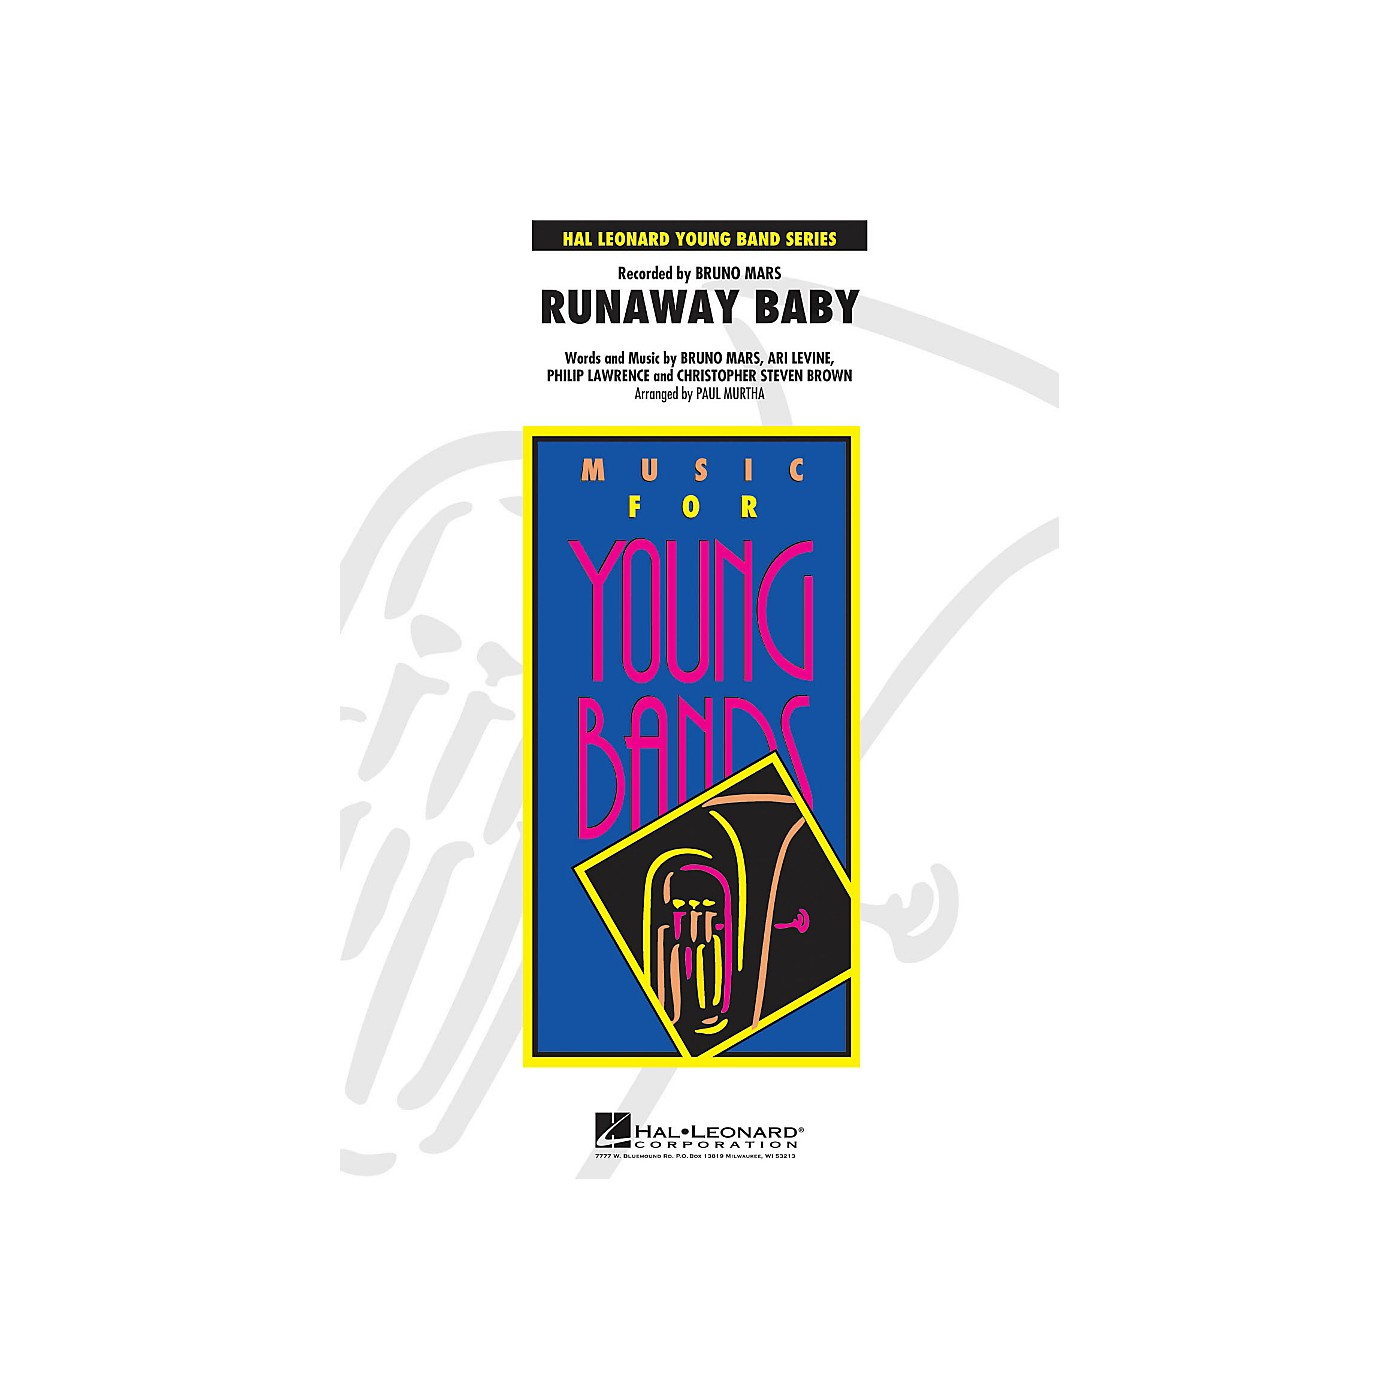 Hal Leonard Runaway Baby - Young Concert Band Series Level 3 thumbnail